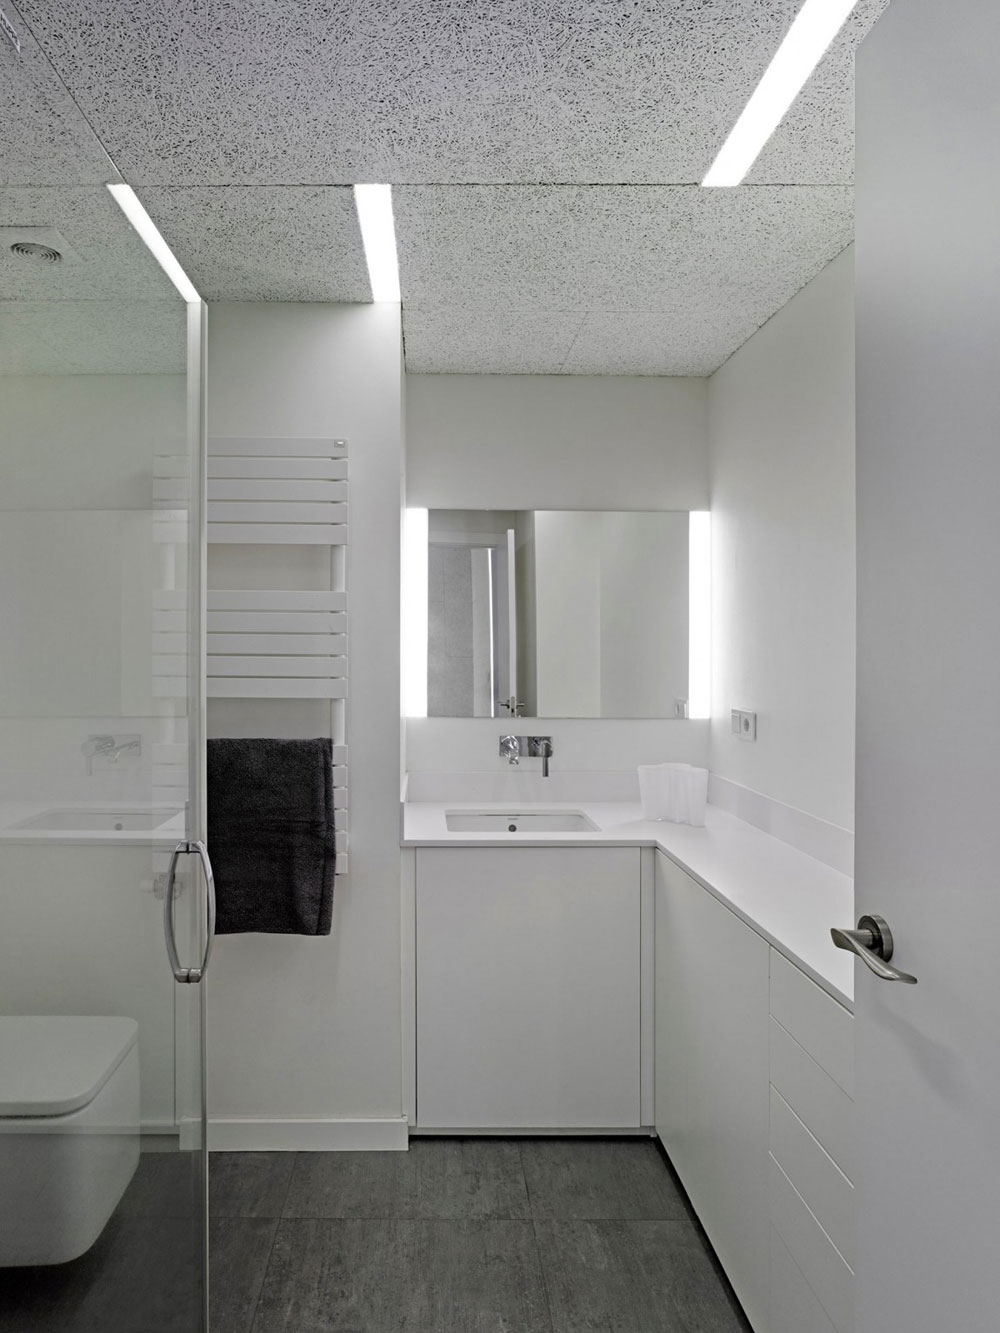 Badrum-inredningsdesign-foton-presenterar-vackra-mönster-7 badrum-inredning-foton-presenterar vackra mönster